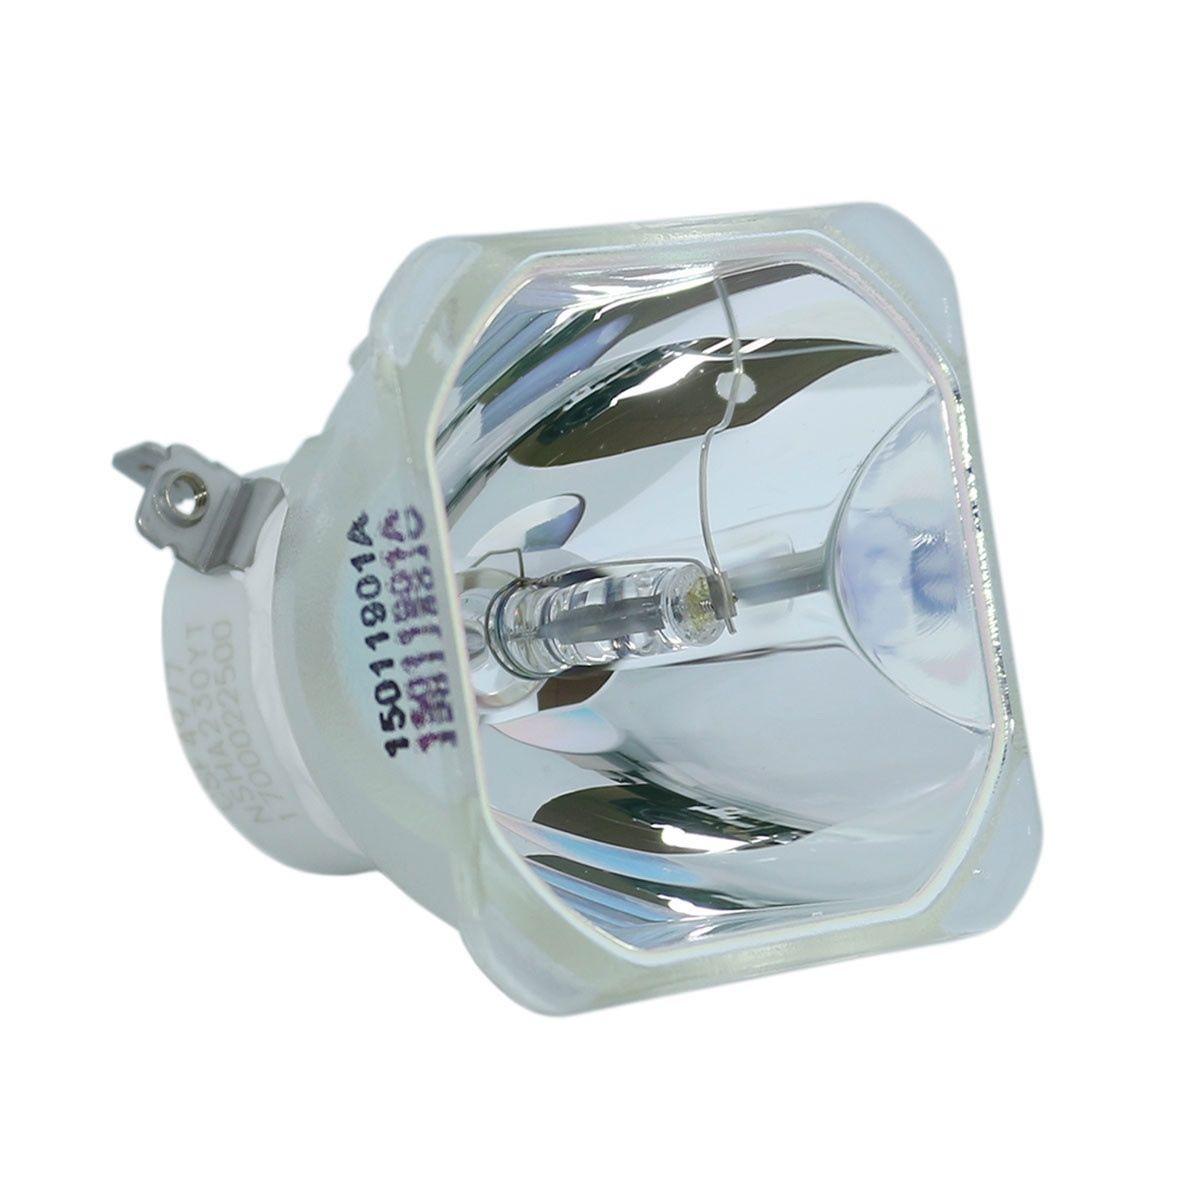 Compatible Bare Bulb LV-LP31 3522B003 for Canon LV-7275 LV-7370 LV-7375 LV-7385 LV-8215 LV-8300 LV-8310 Projector Lamp Bulb